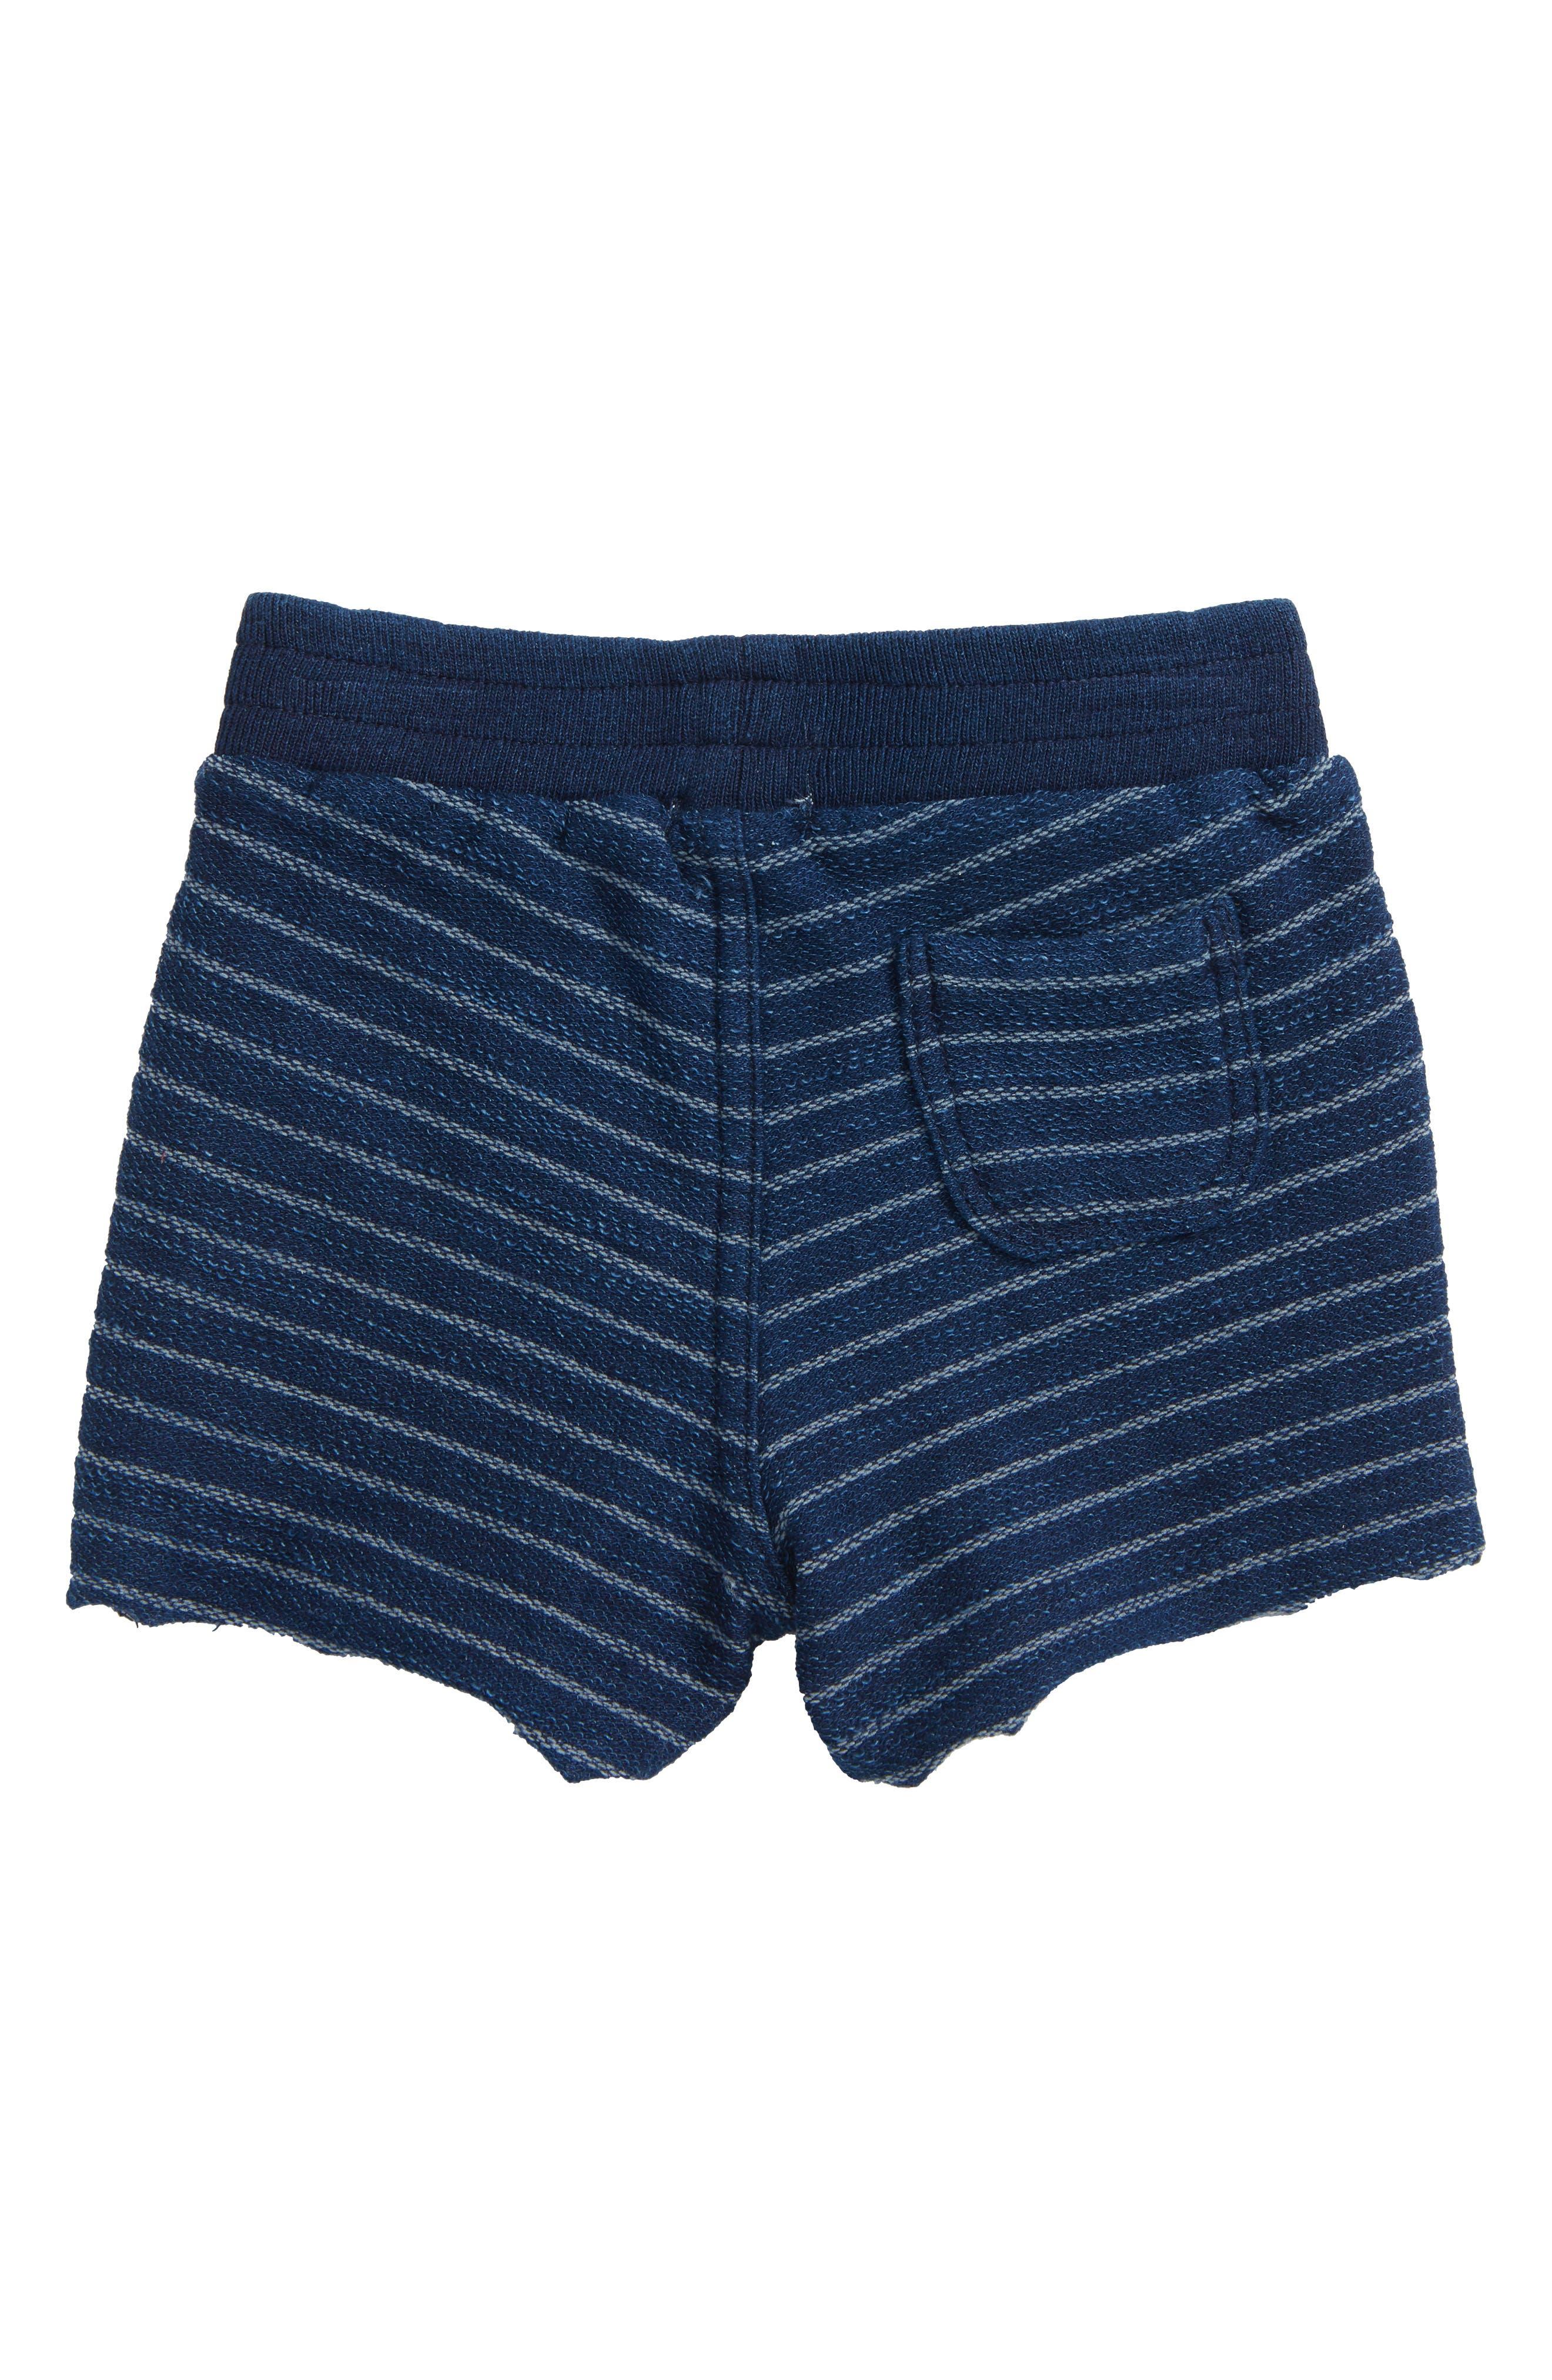 Indigo Stripe French Terry Shorts,                             Alternate thumbnail 2, color,                             400